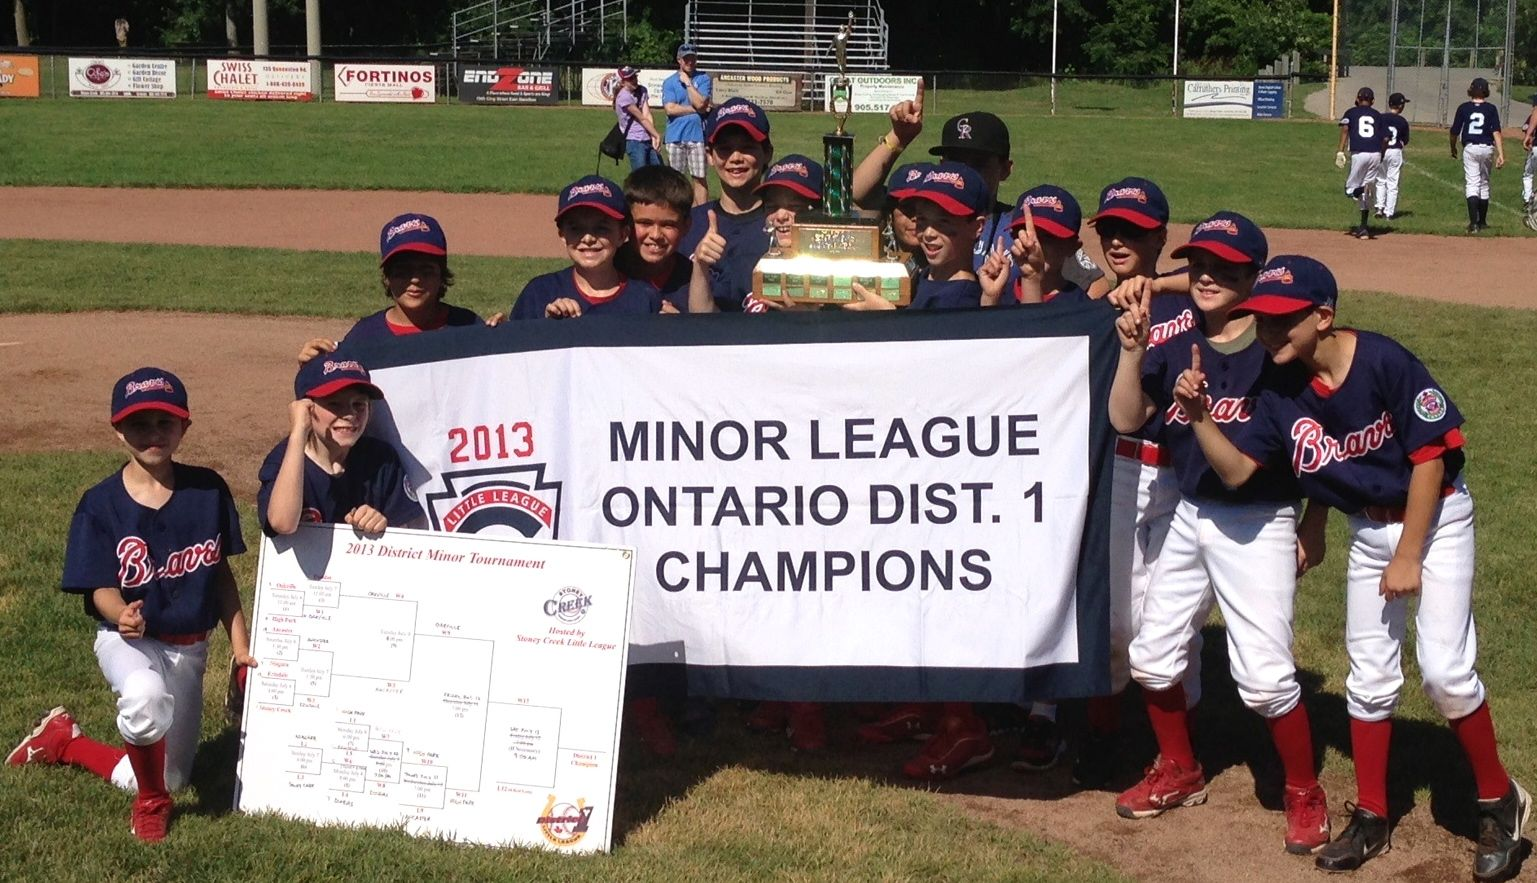 2013 Minor Champions